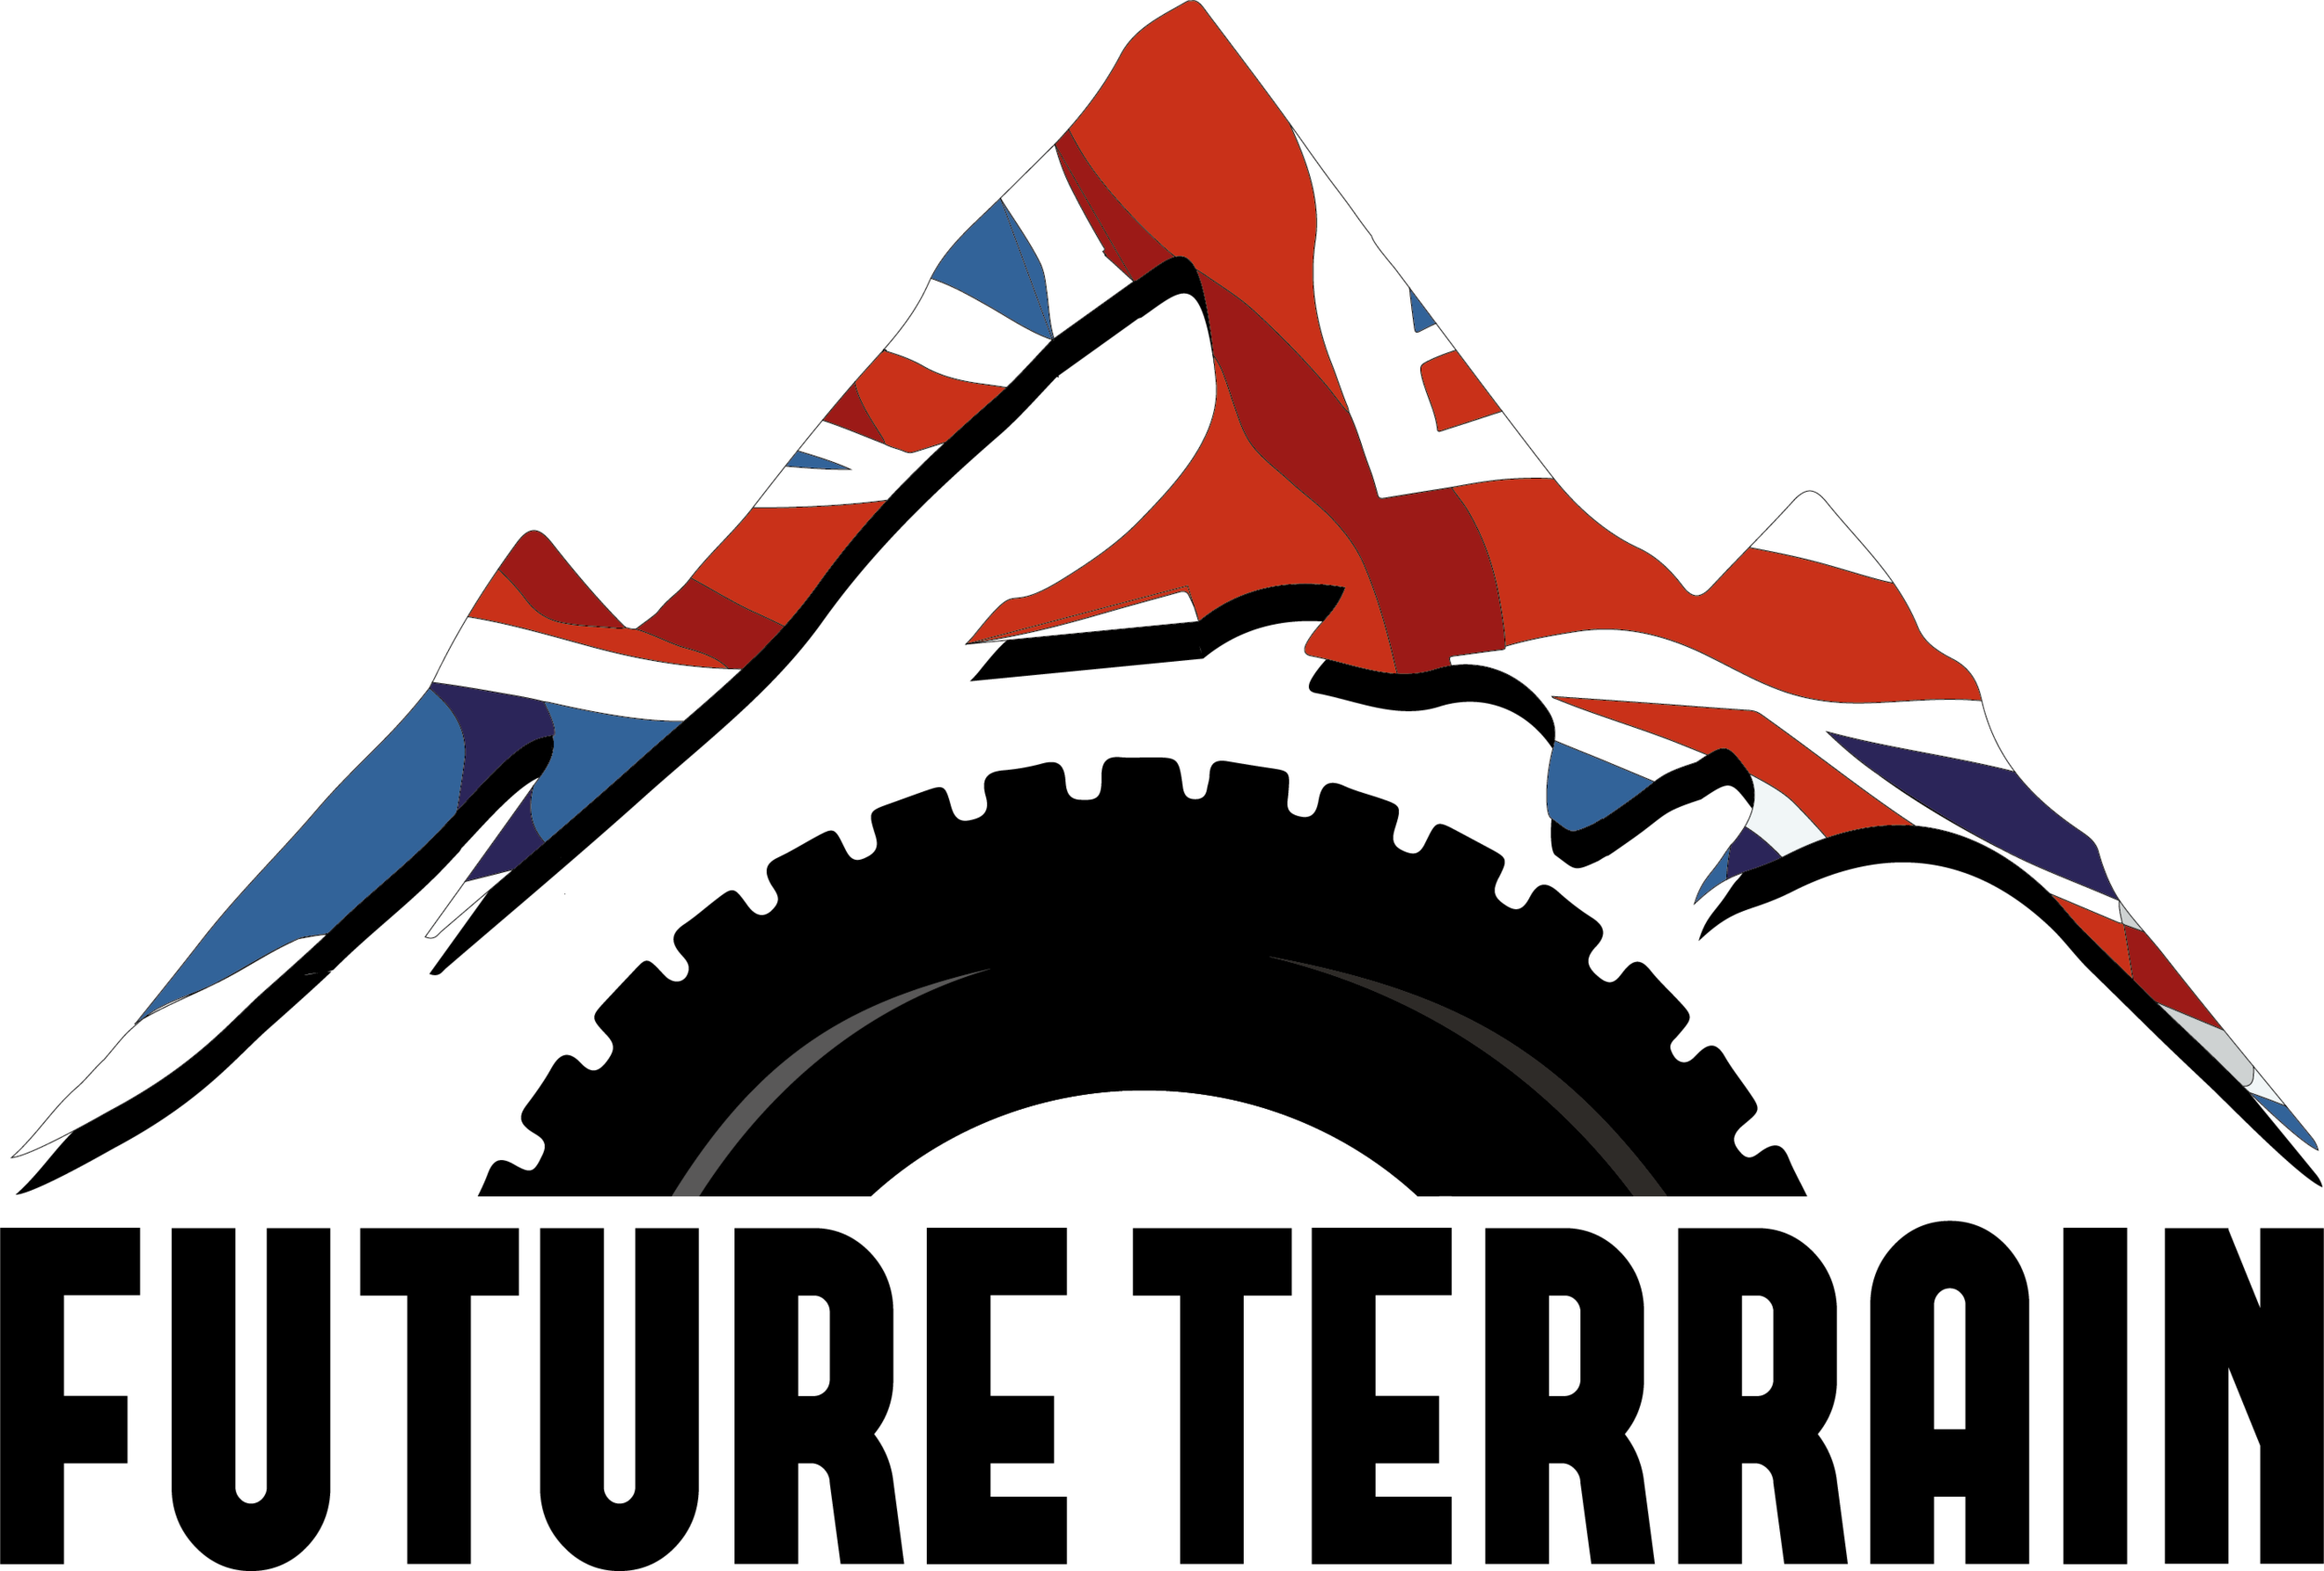 FUTURETERRAIN v2 logo (3).jpeg.png